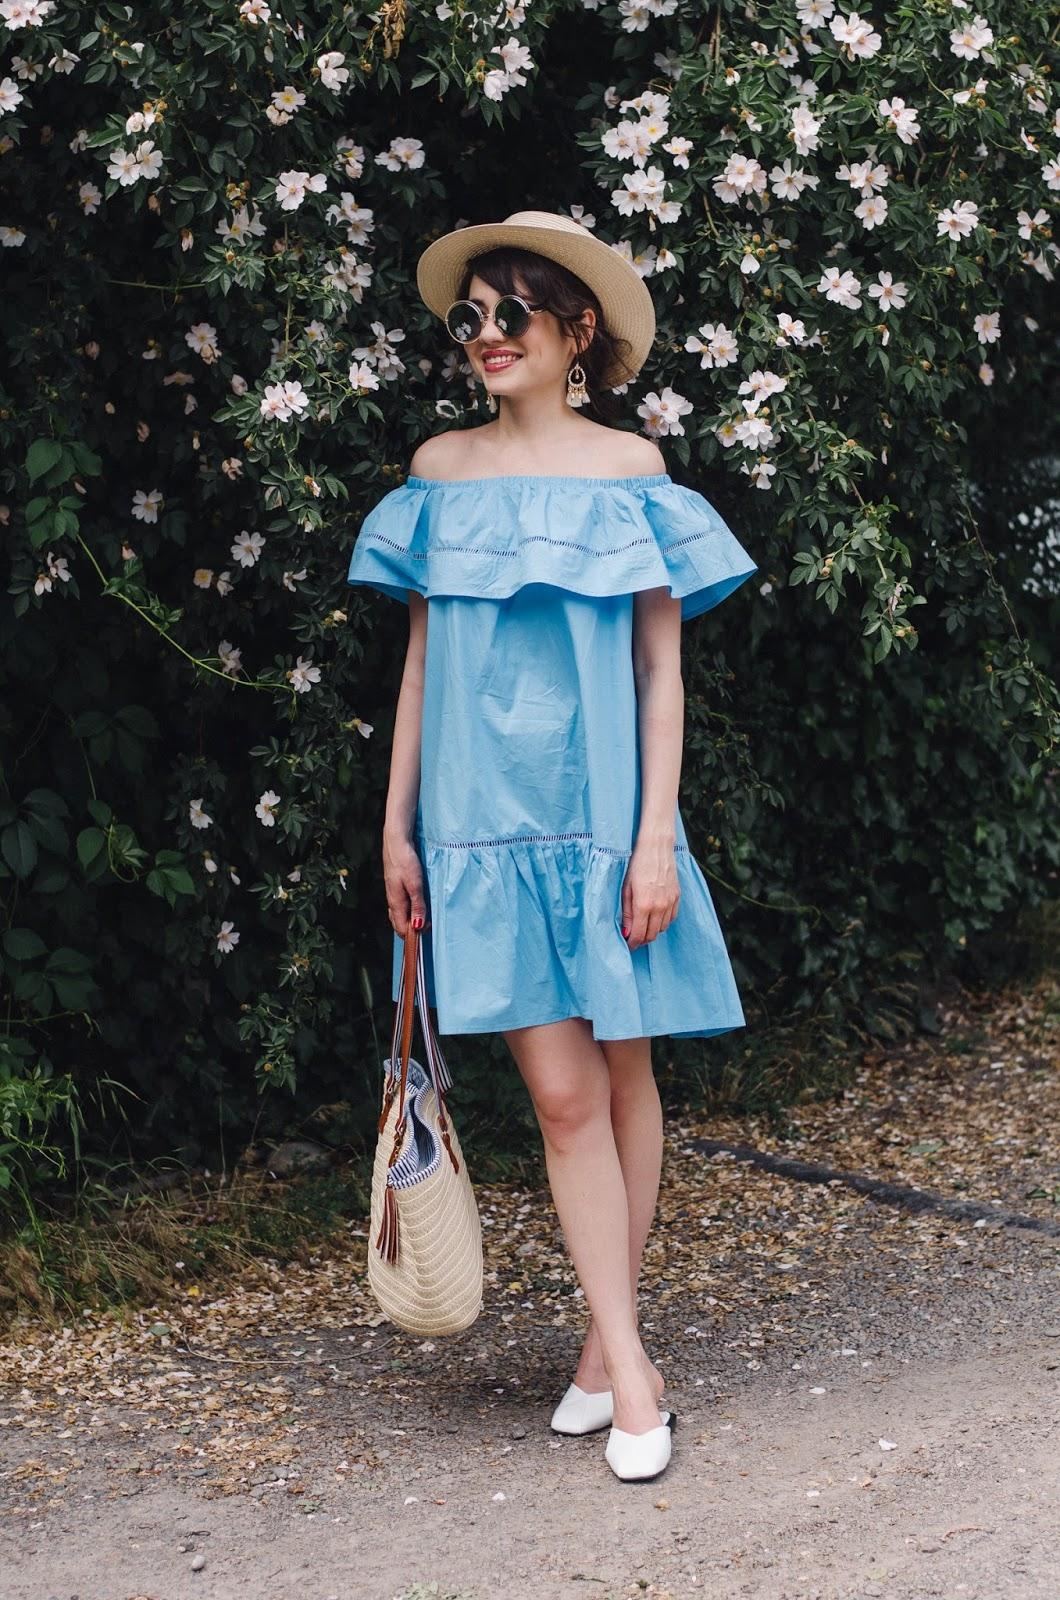 fashion blogger diyrasnotes diyora beta oversized dress offshouldersdress blue straw hat straw bag shopper bag mules white